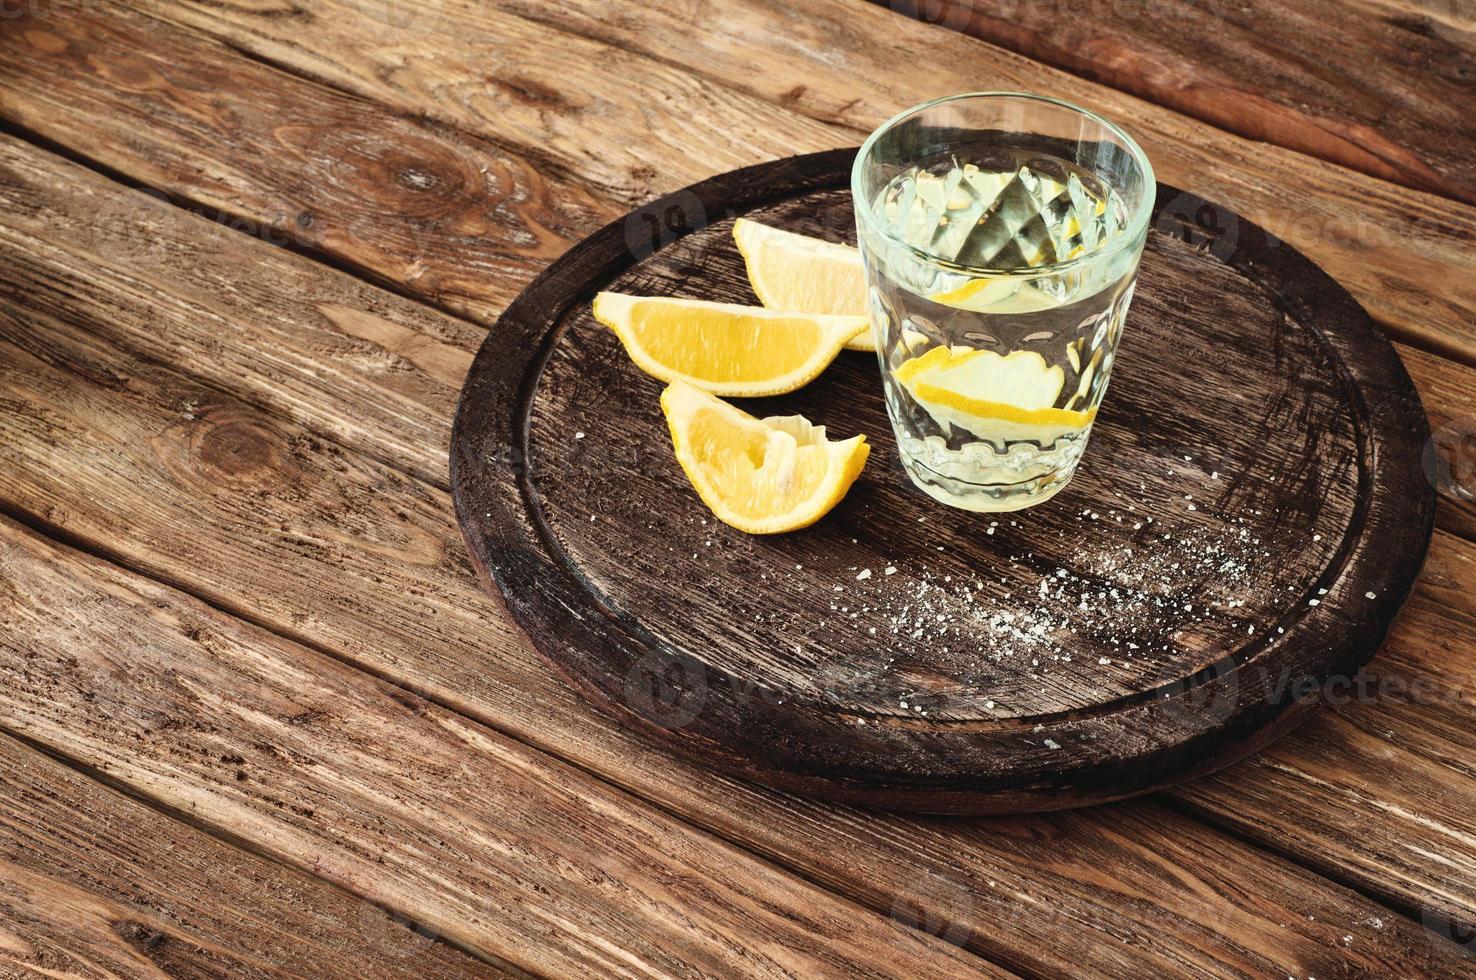 glas tequila med citronskivor på en träbakgrund foto